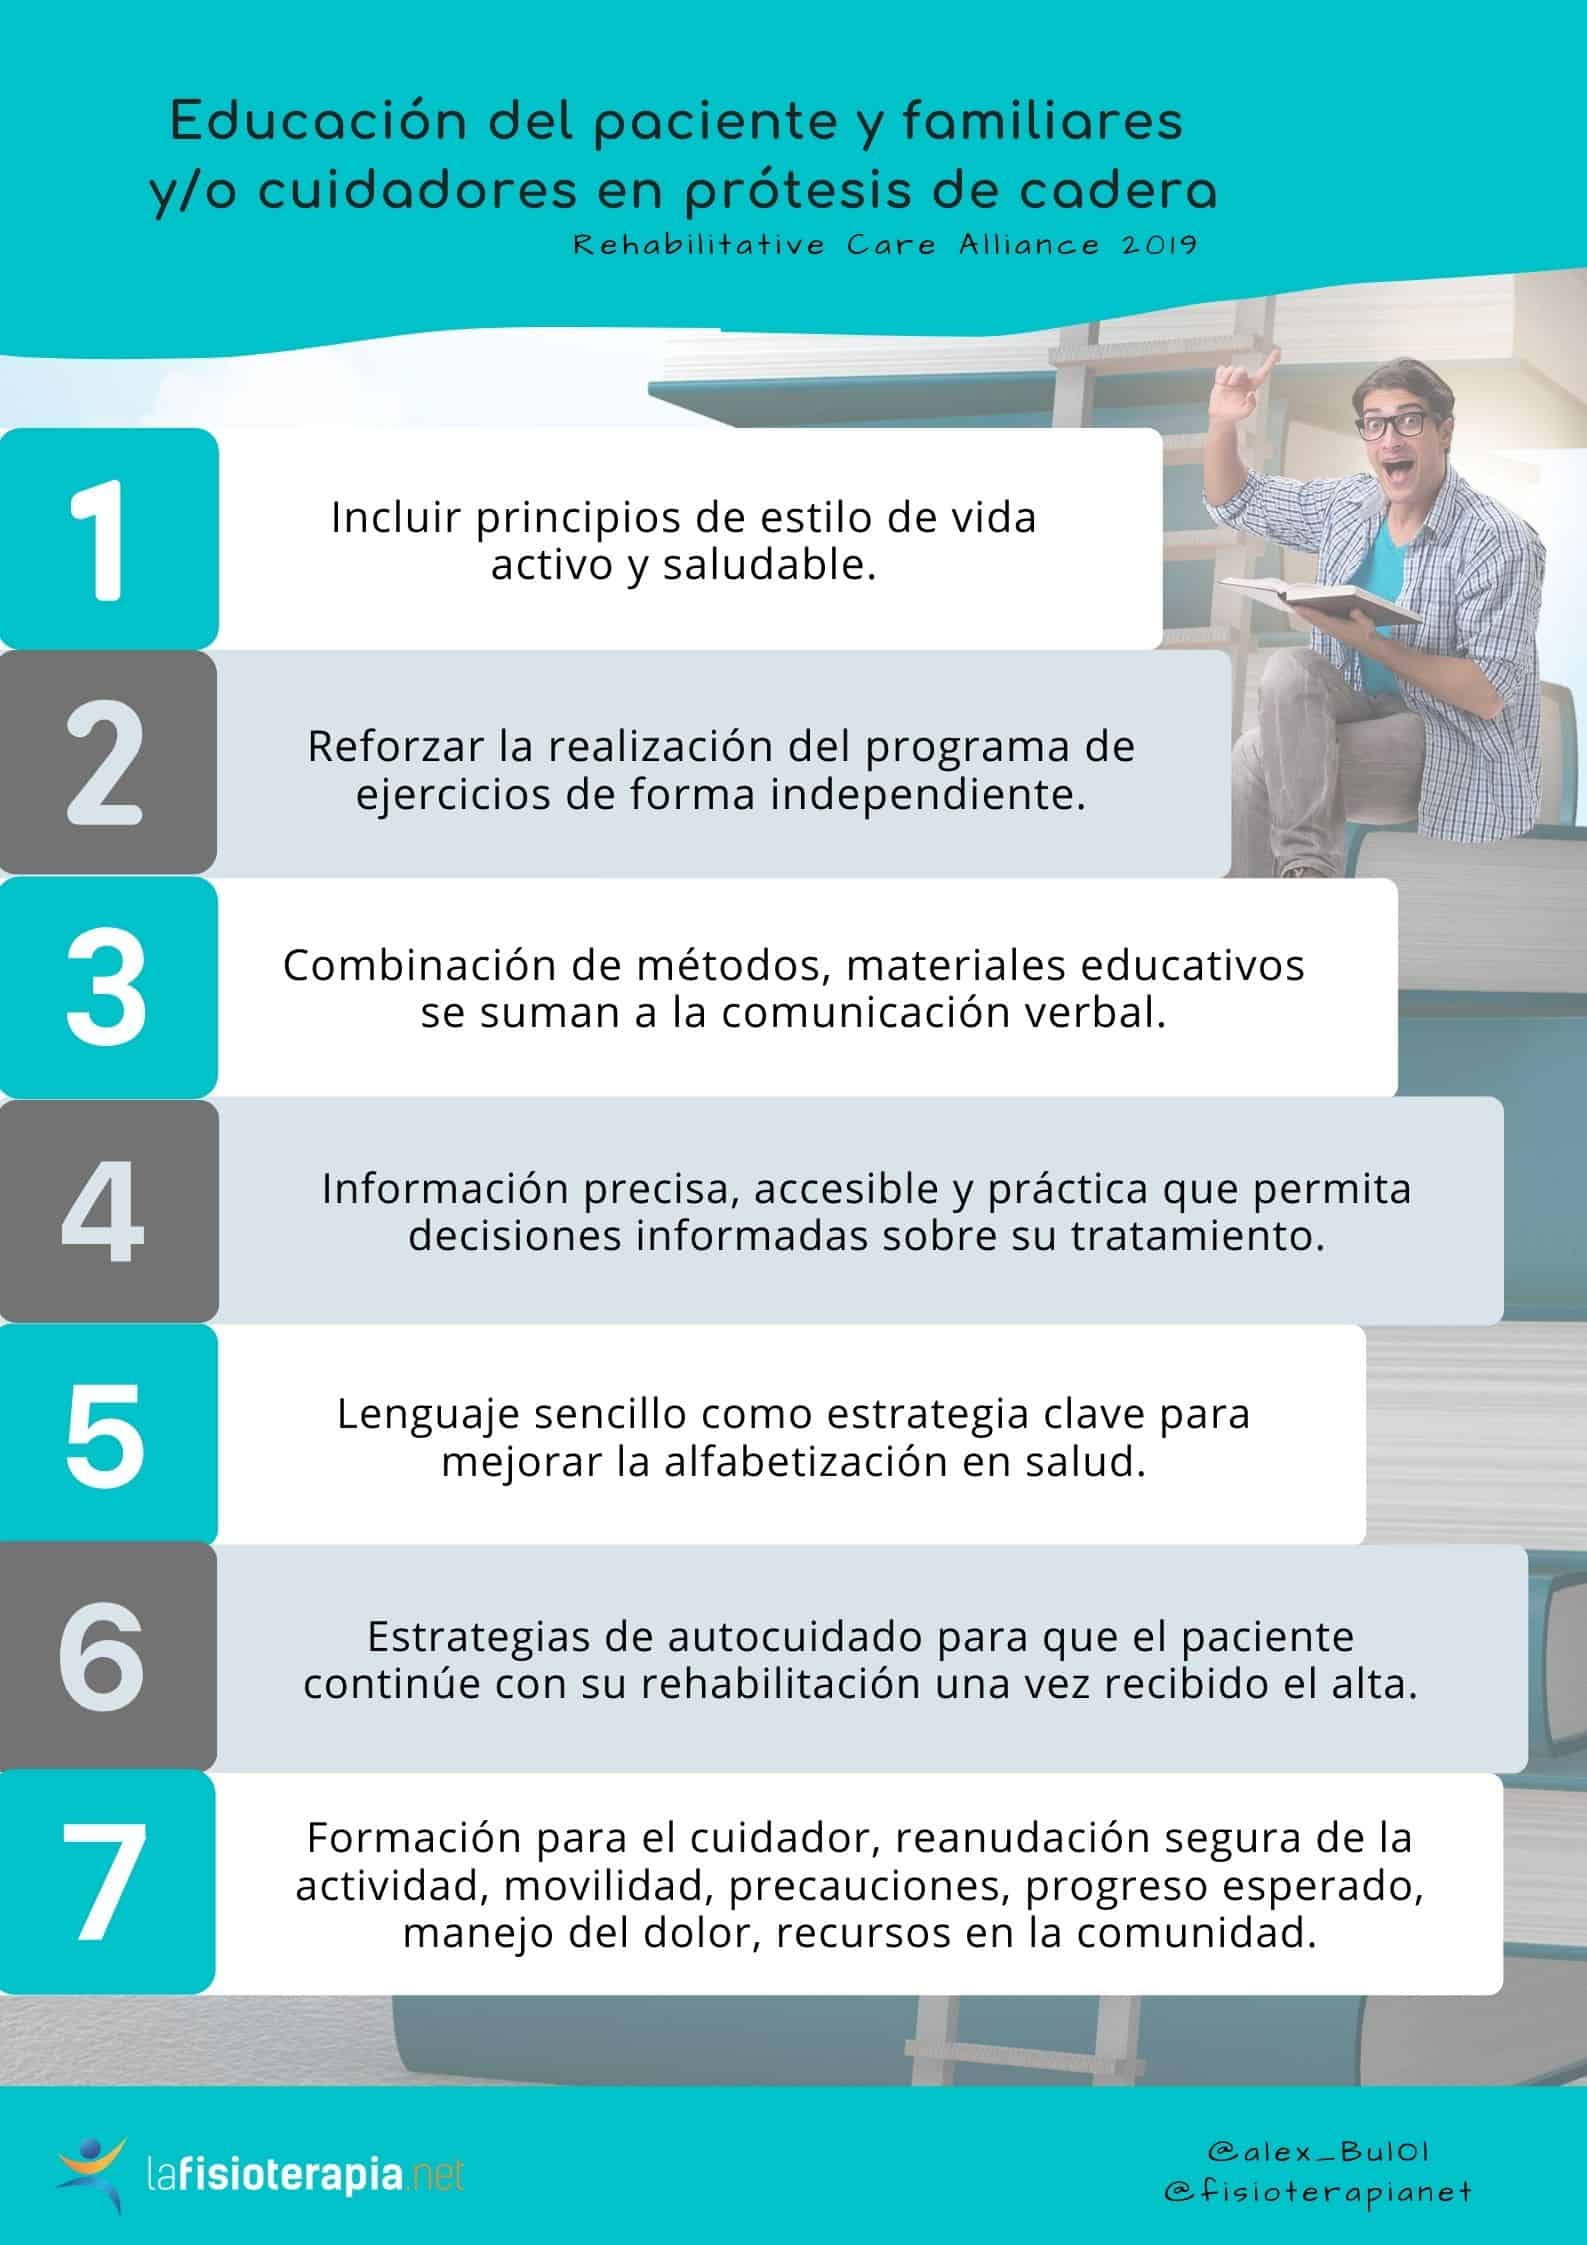 educacion en rehabilitation protesis cadera